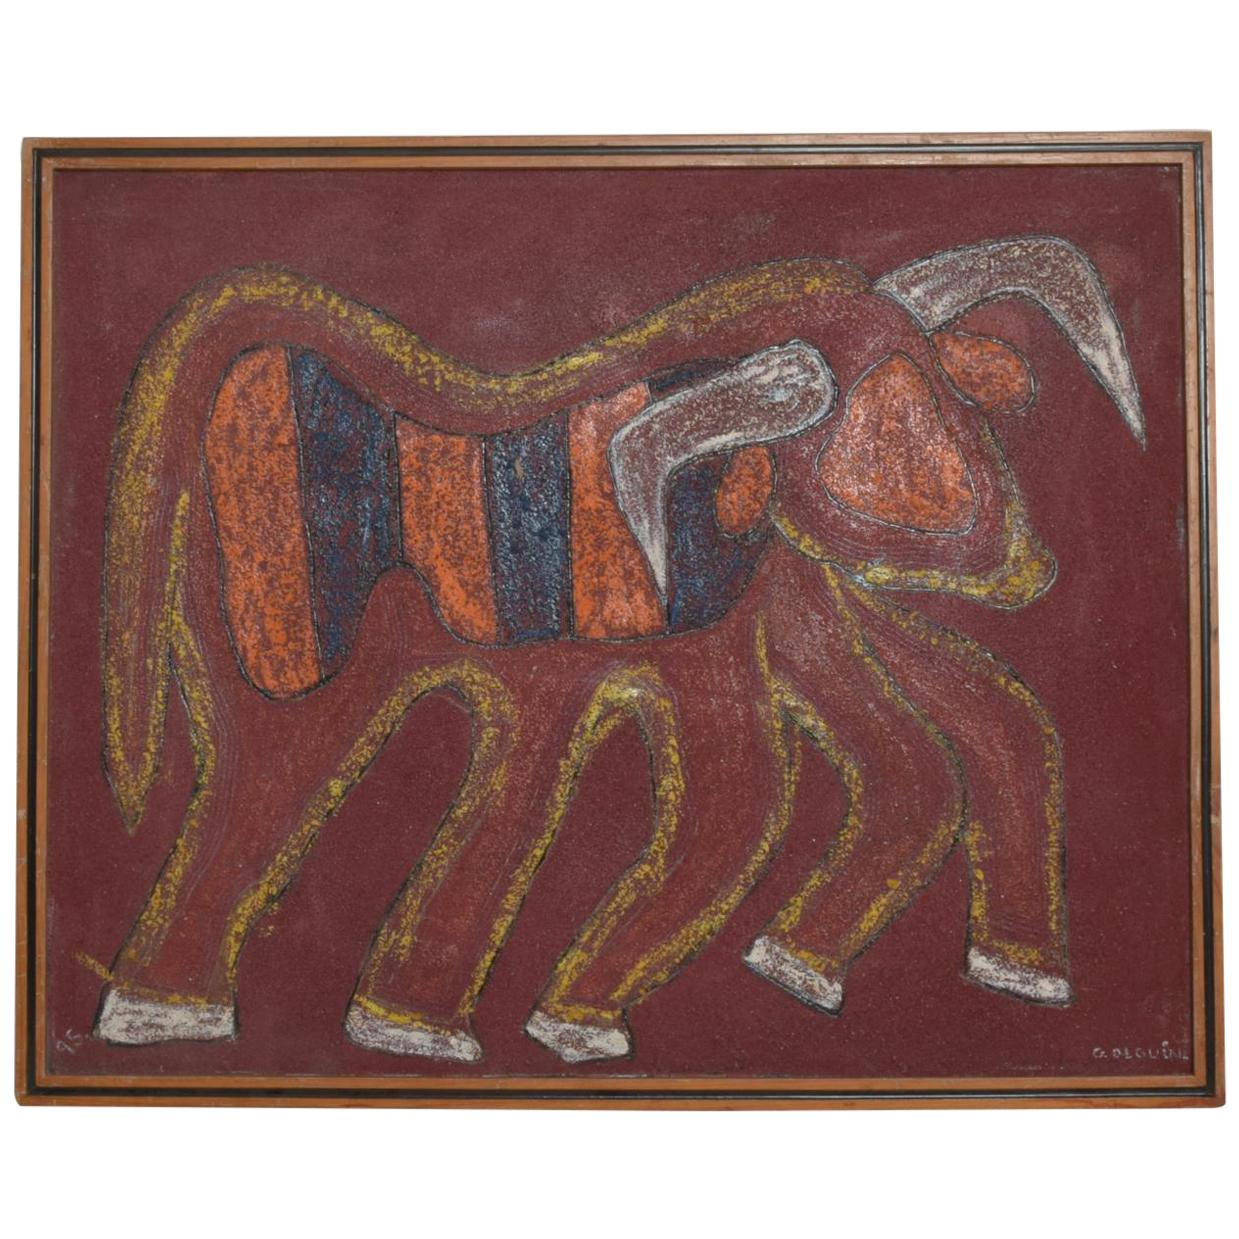 Guillermo Olguin Painting Toro De Carnaval Modern Art Painting